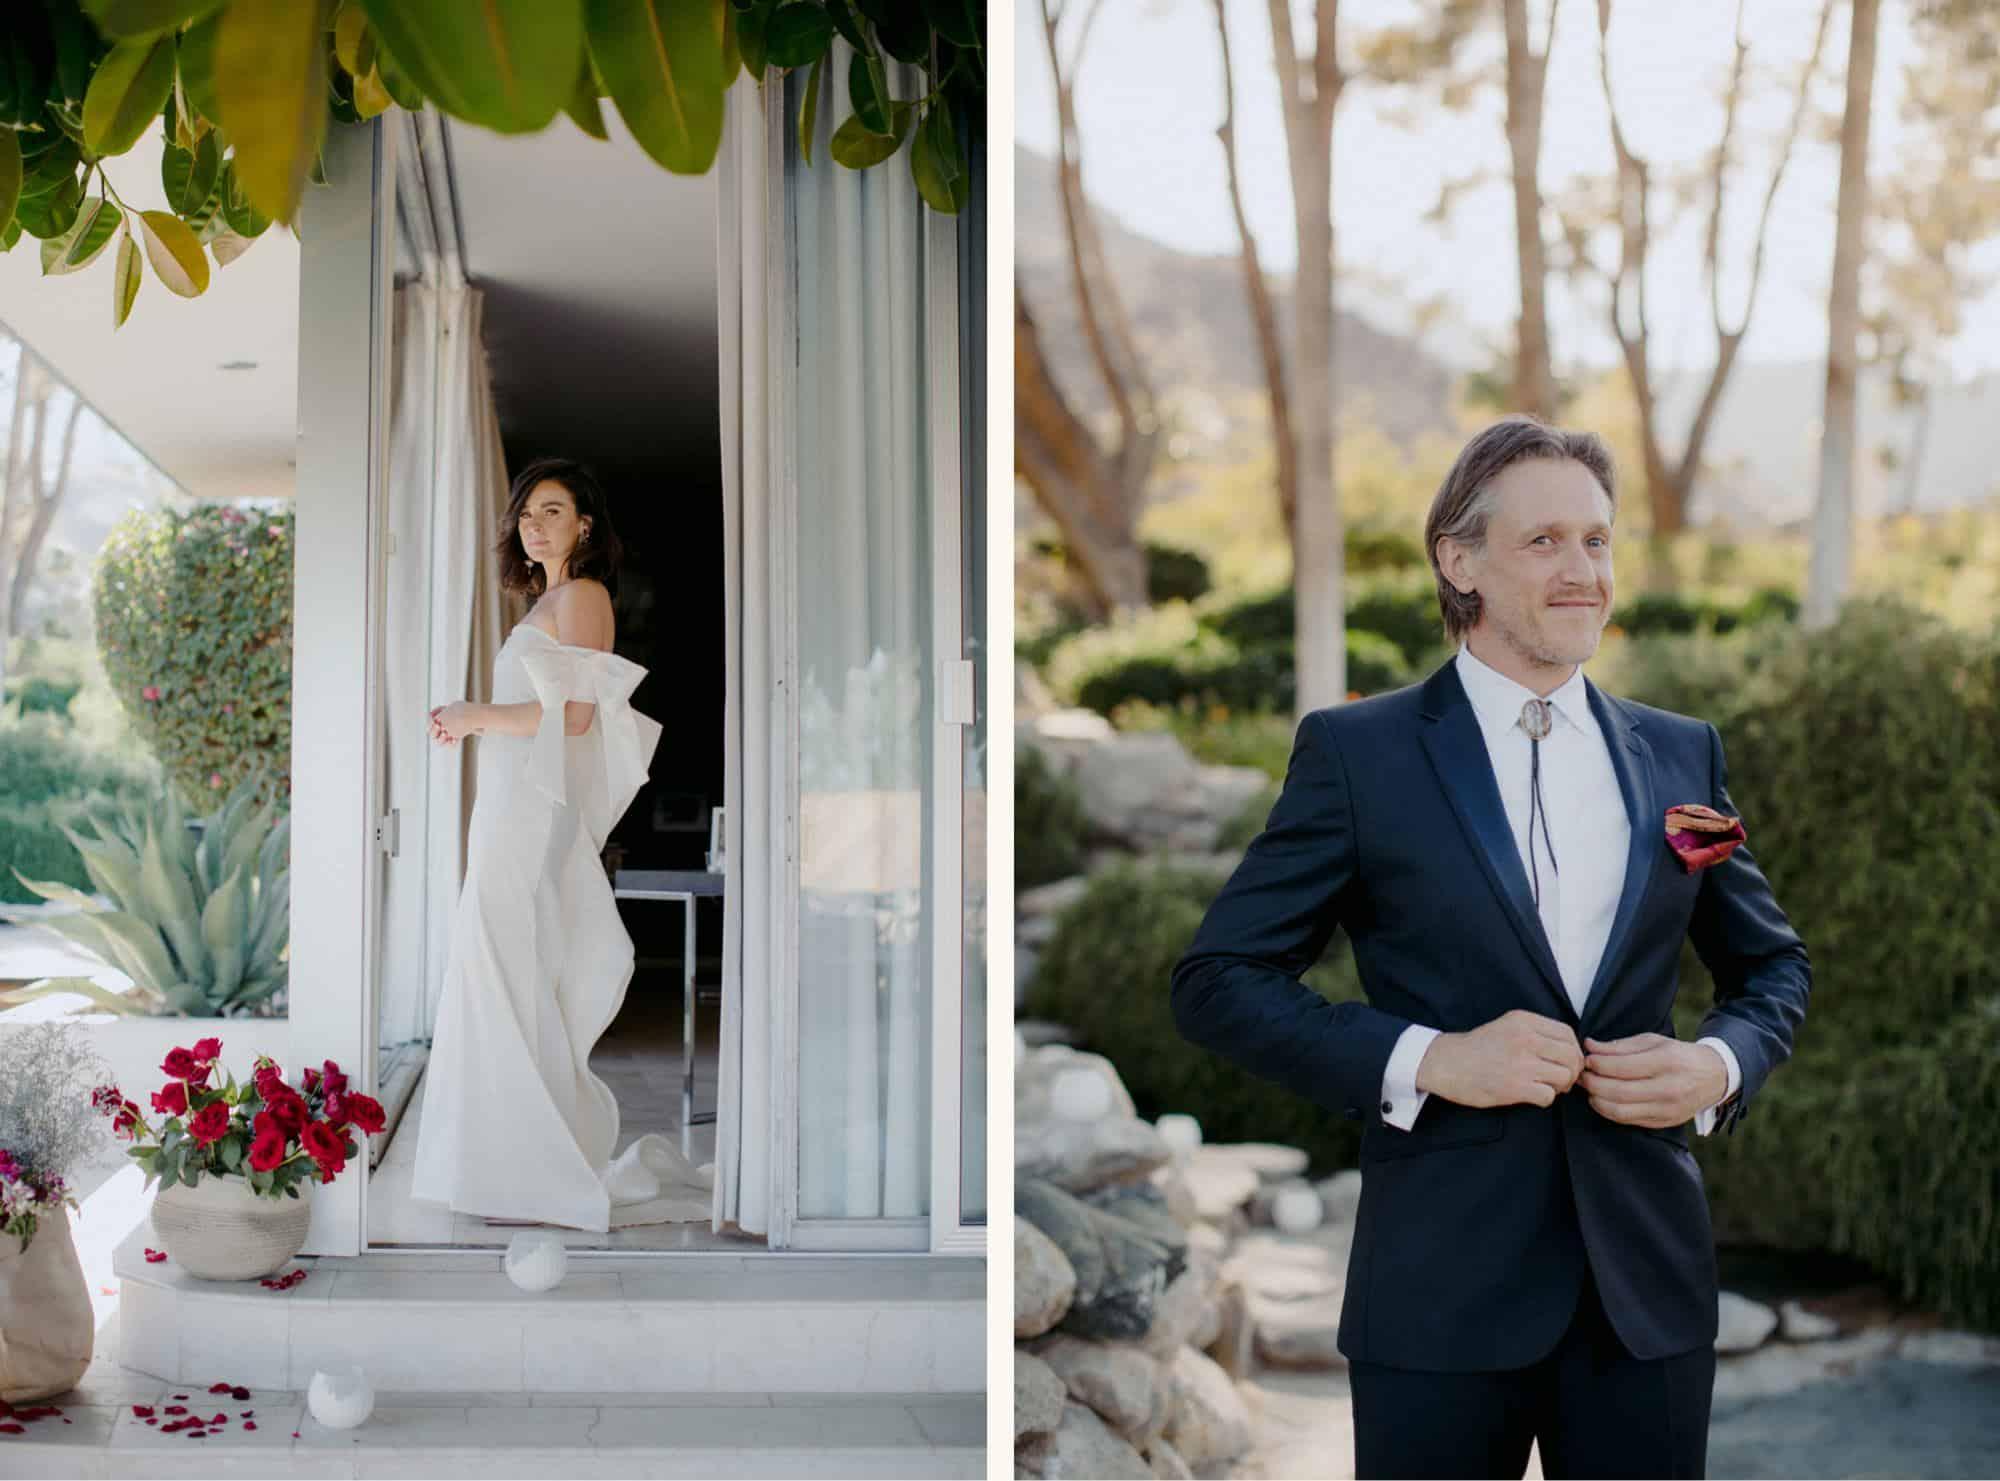 Frederick Loewe Estate Wedding – Palm Springs, California